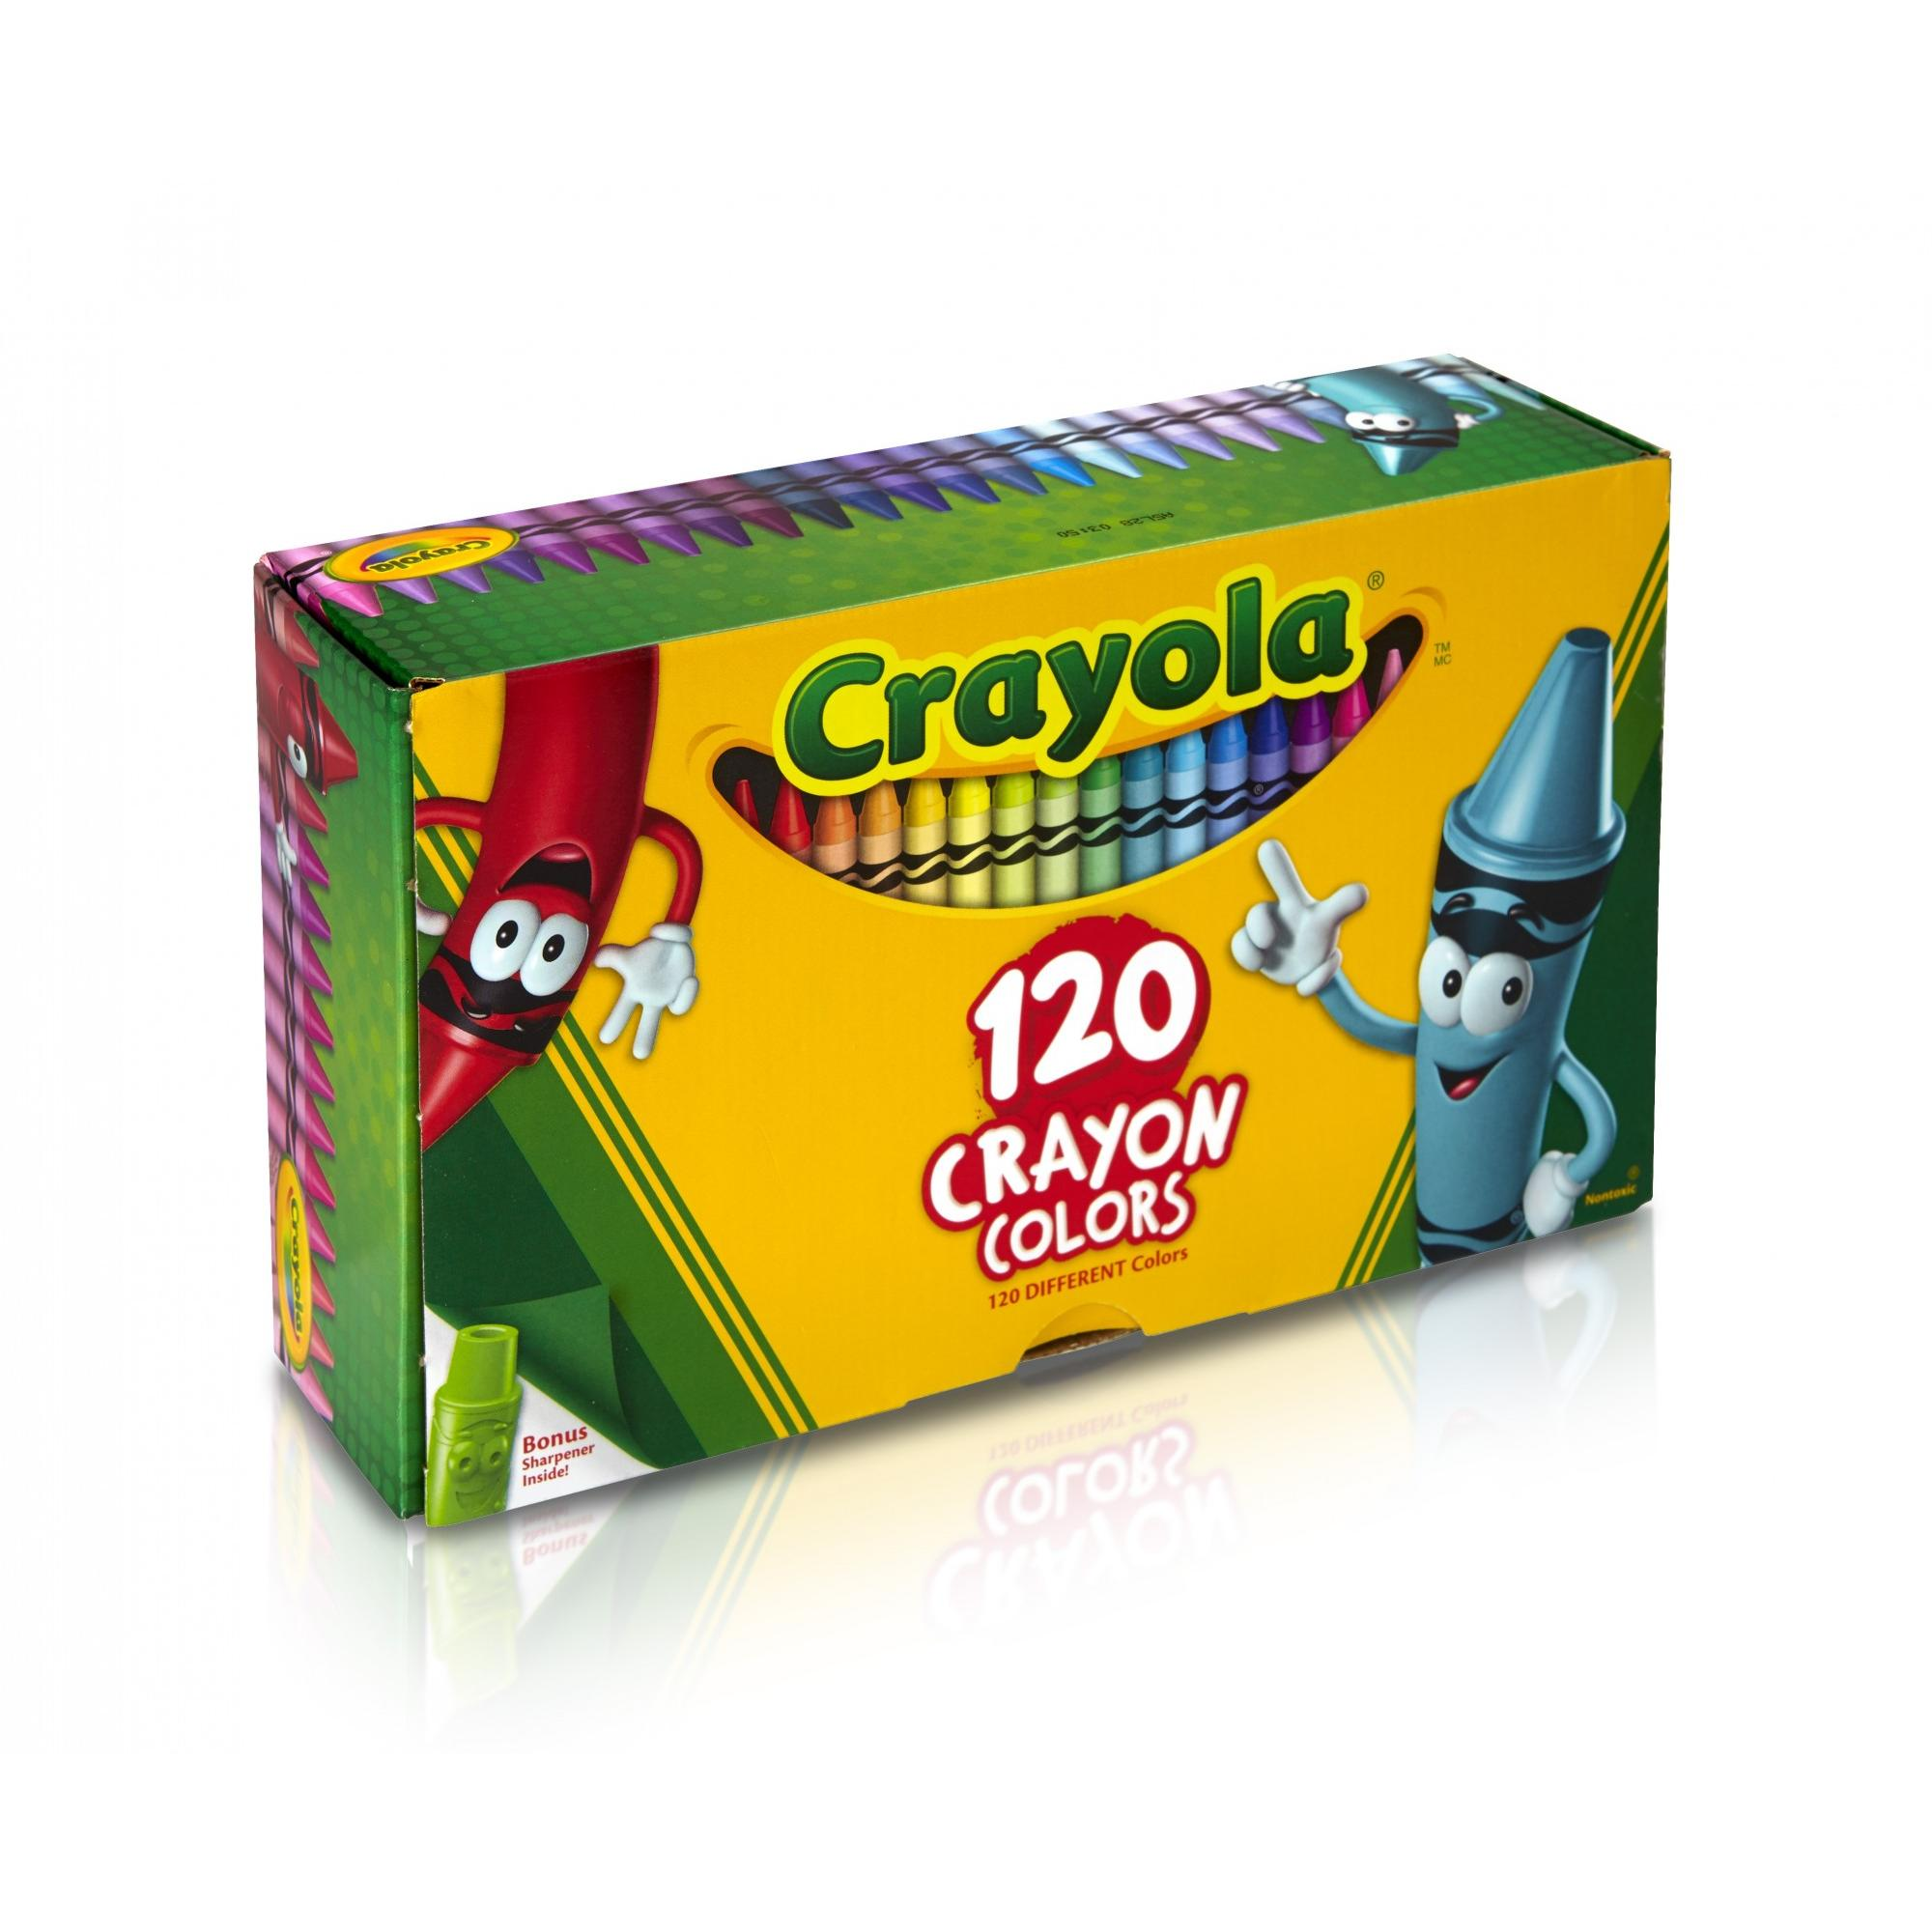 Crayola Classic Crayons 120 Count With Tip Crayon